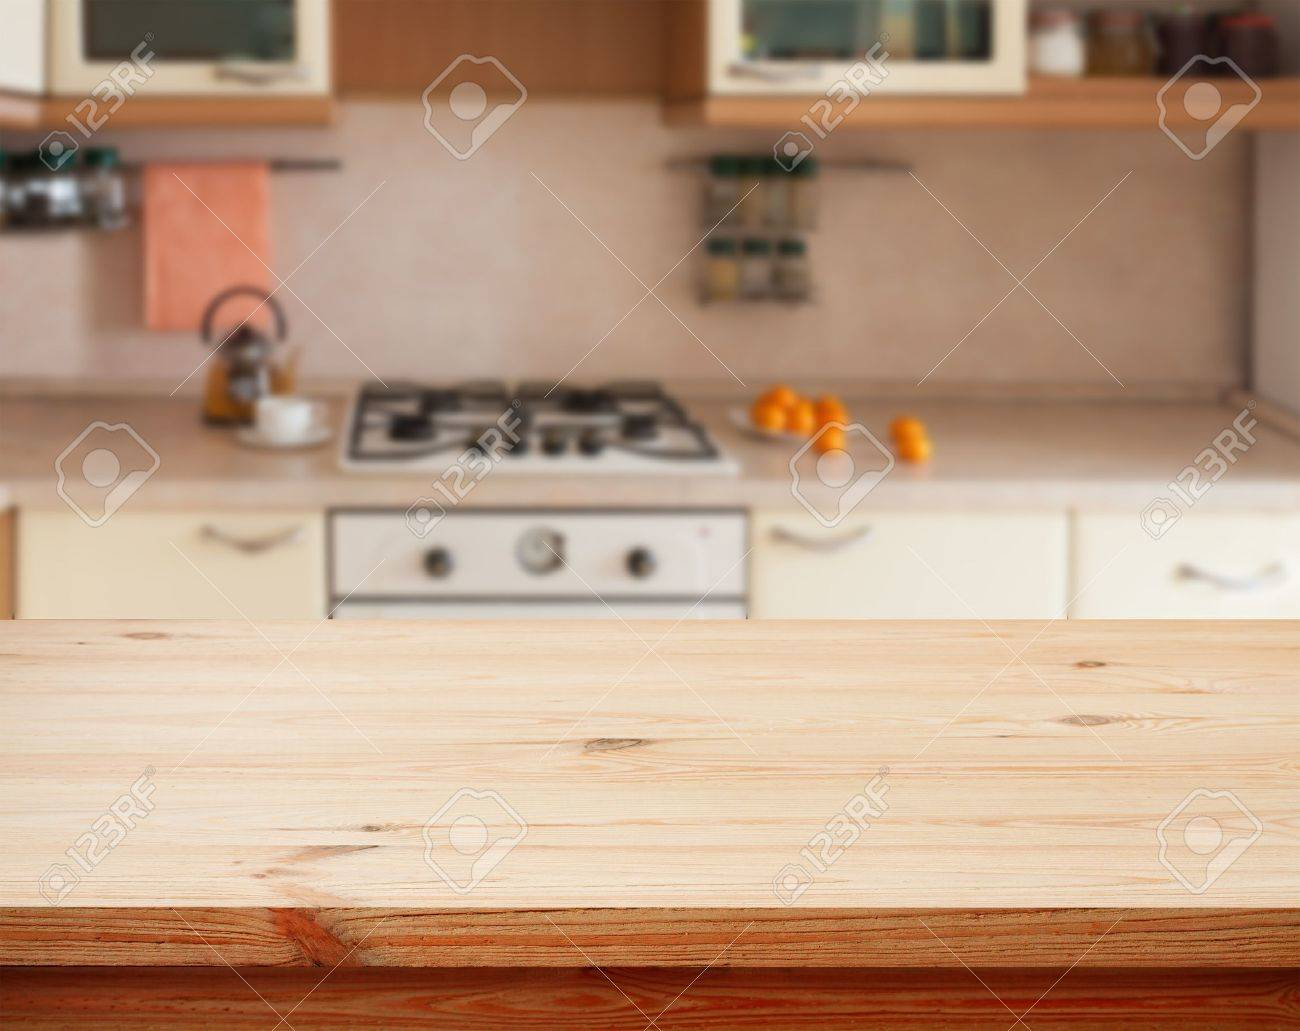 Kitchen Table Close Up Kitchen Interior Empty Wooden Table Closeuphorizontally Stock